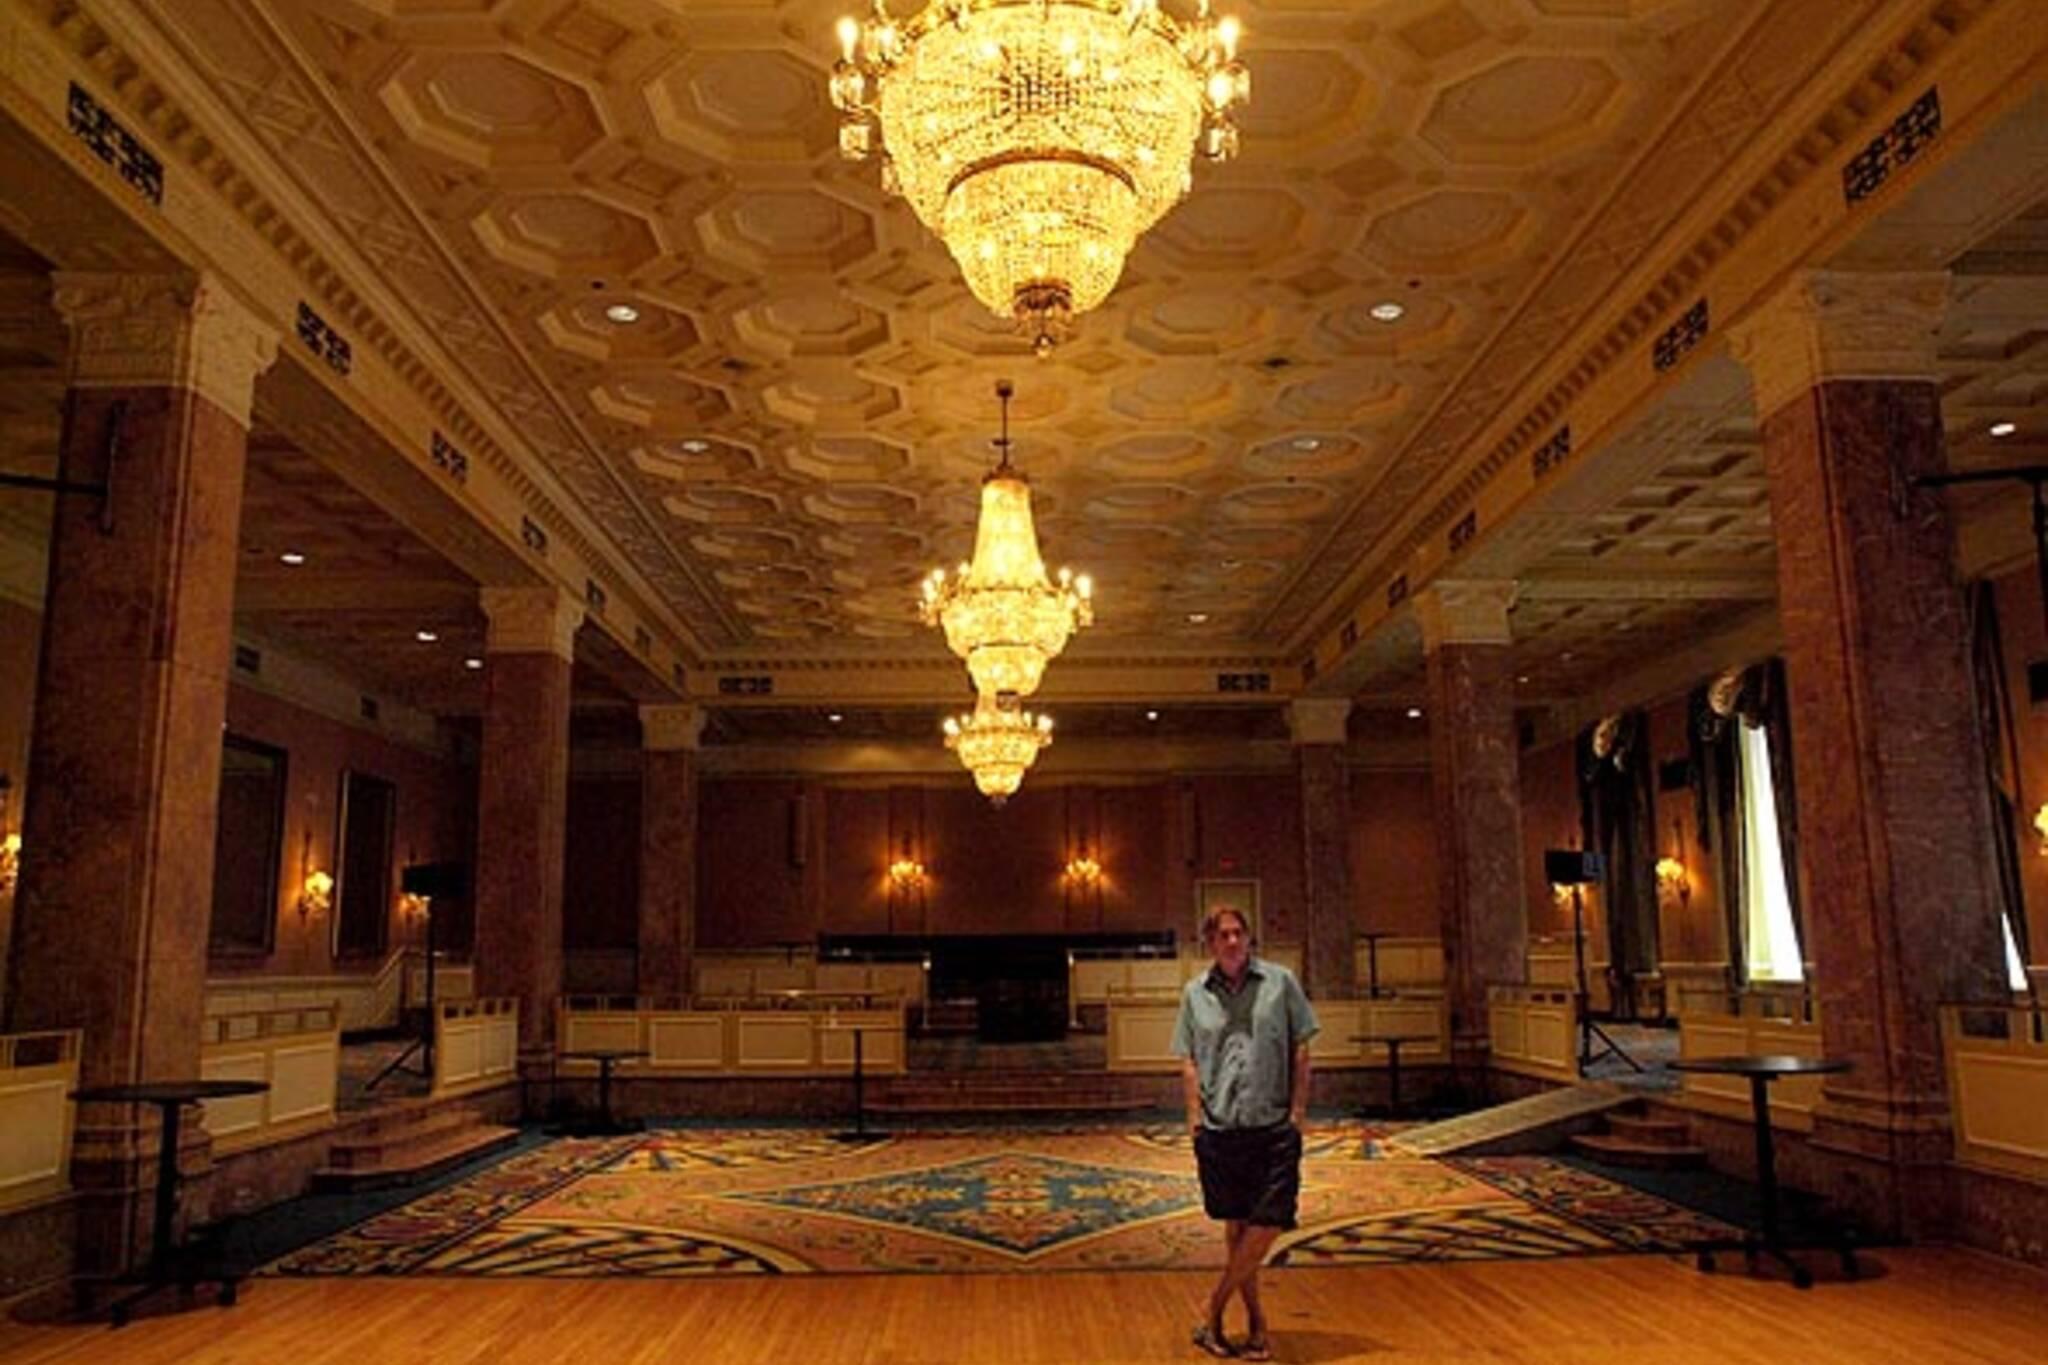 Christopher Heard Royal York Hotel